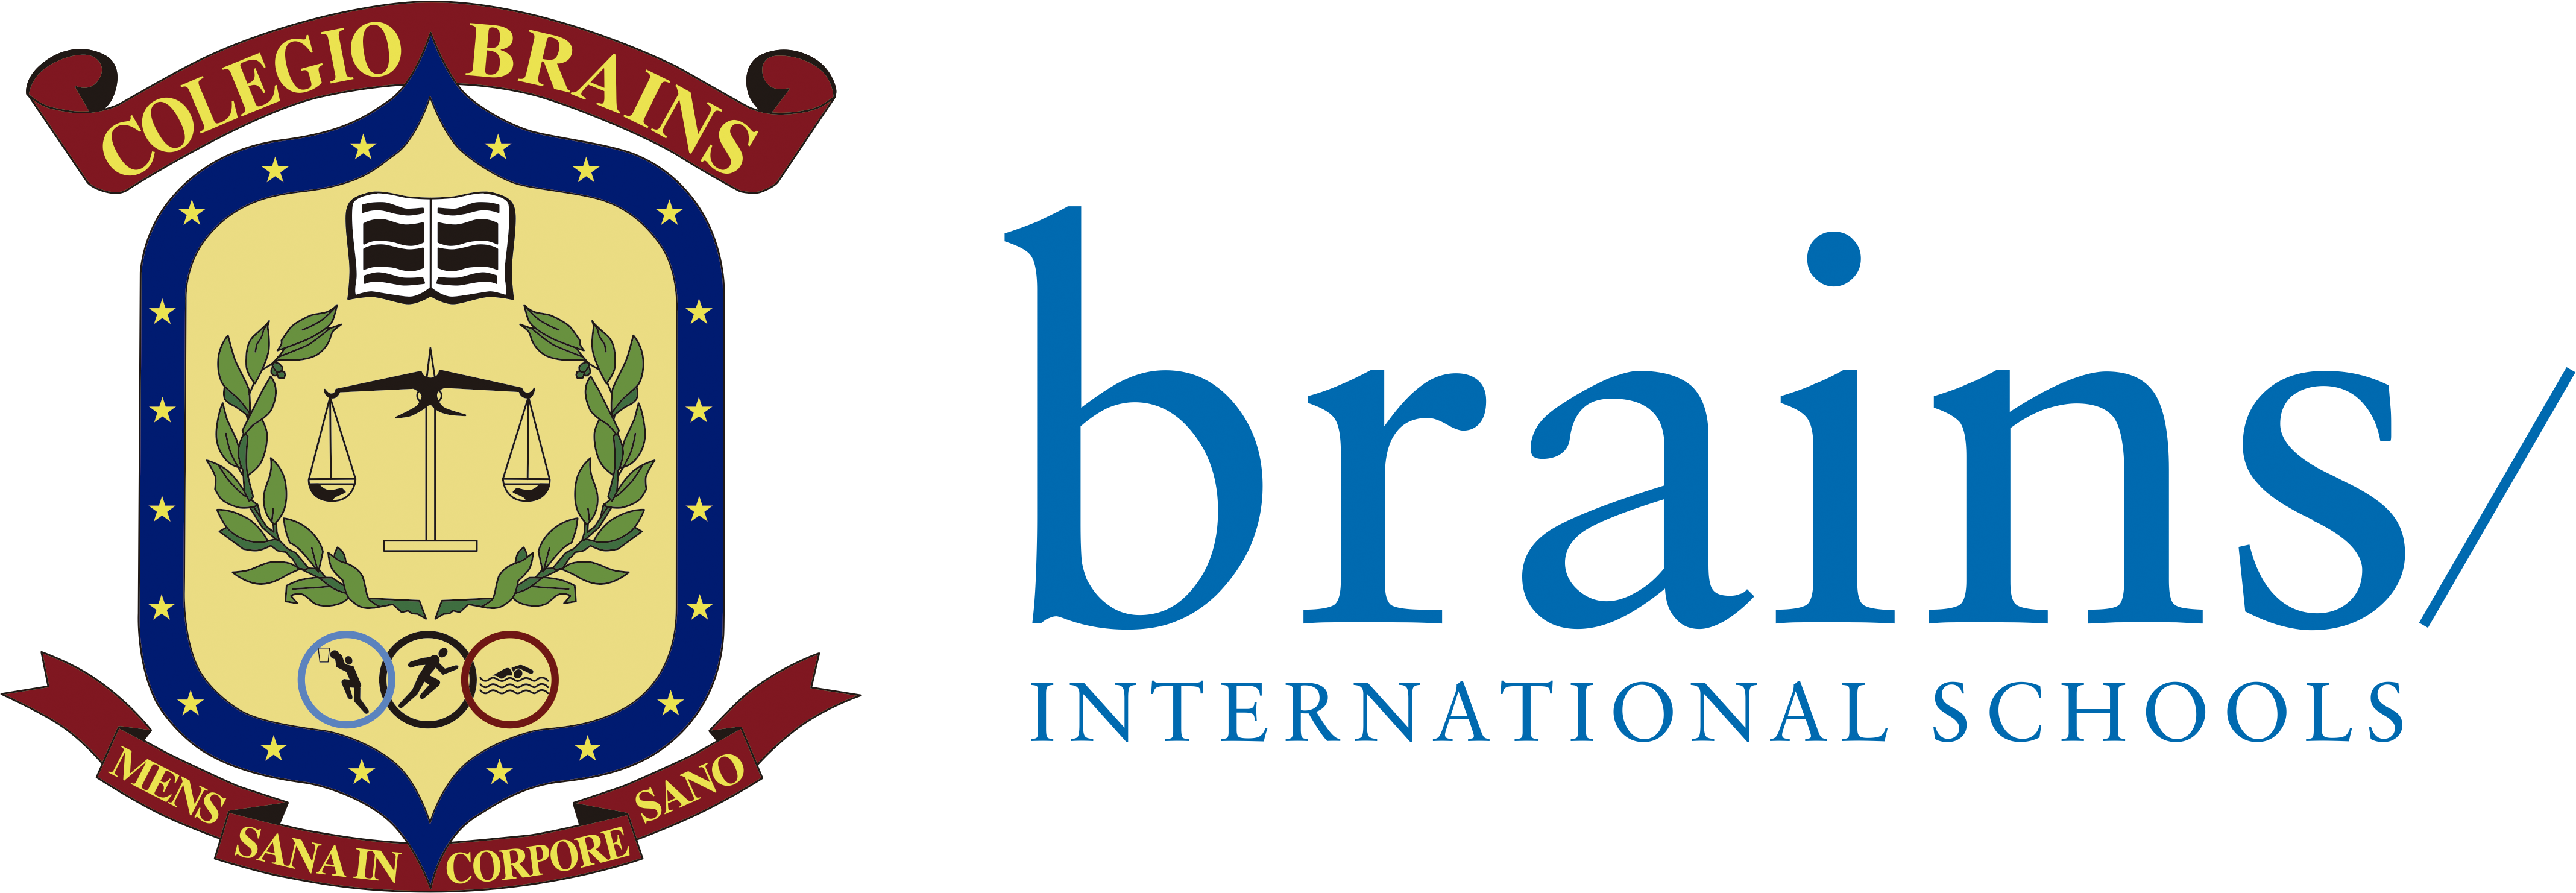 Brains International Schools